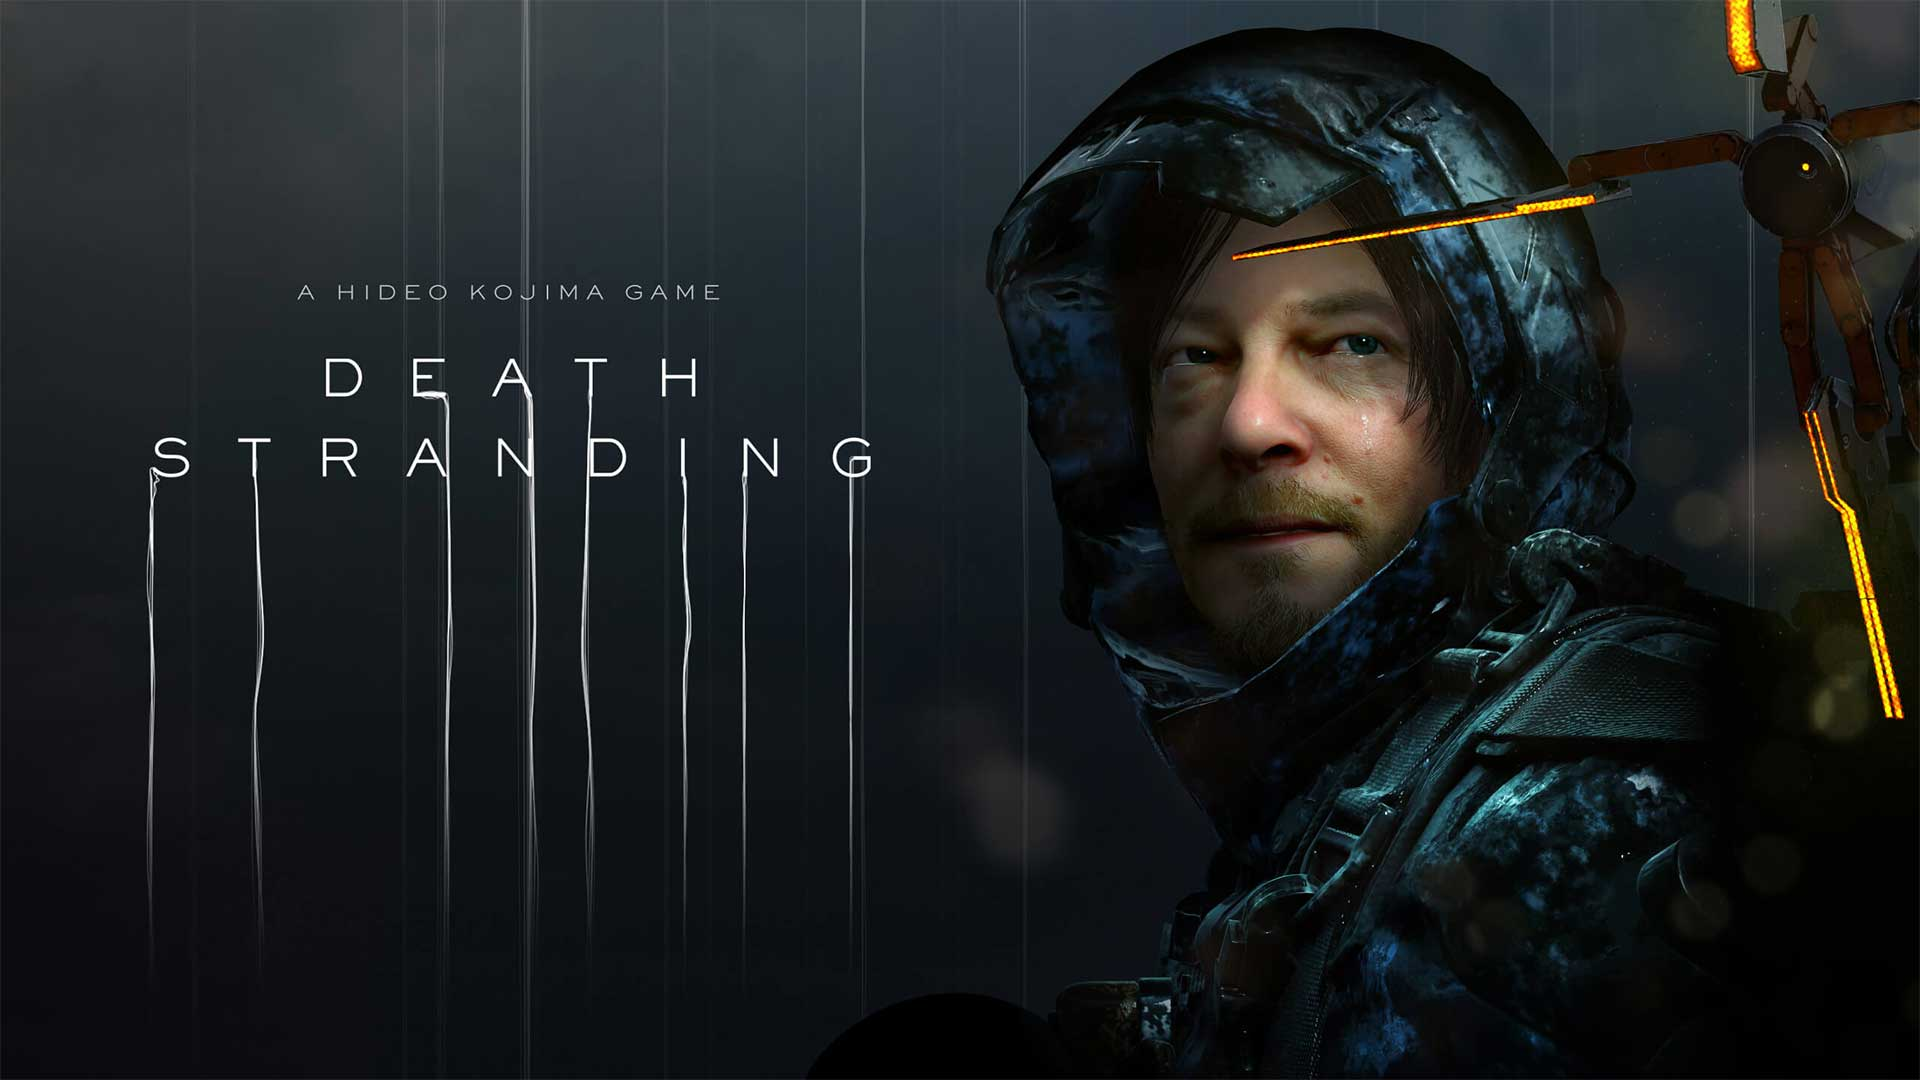 kojima death stranding pc version